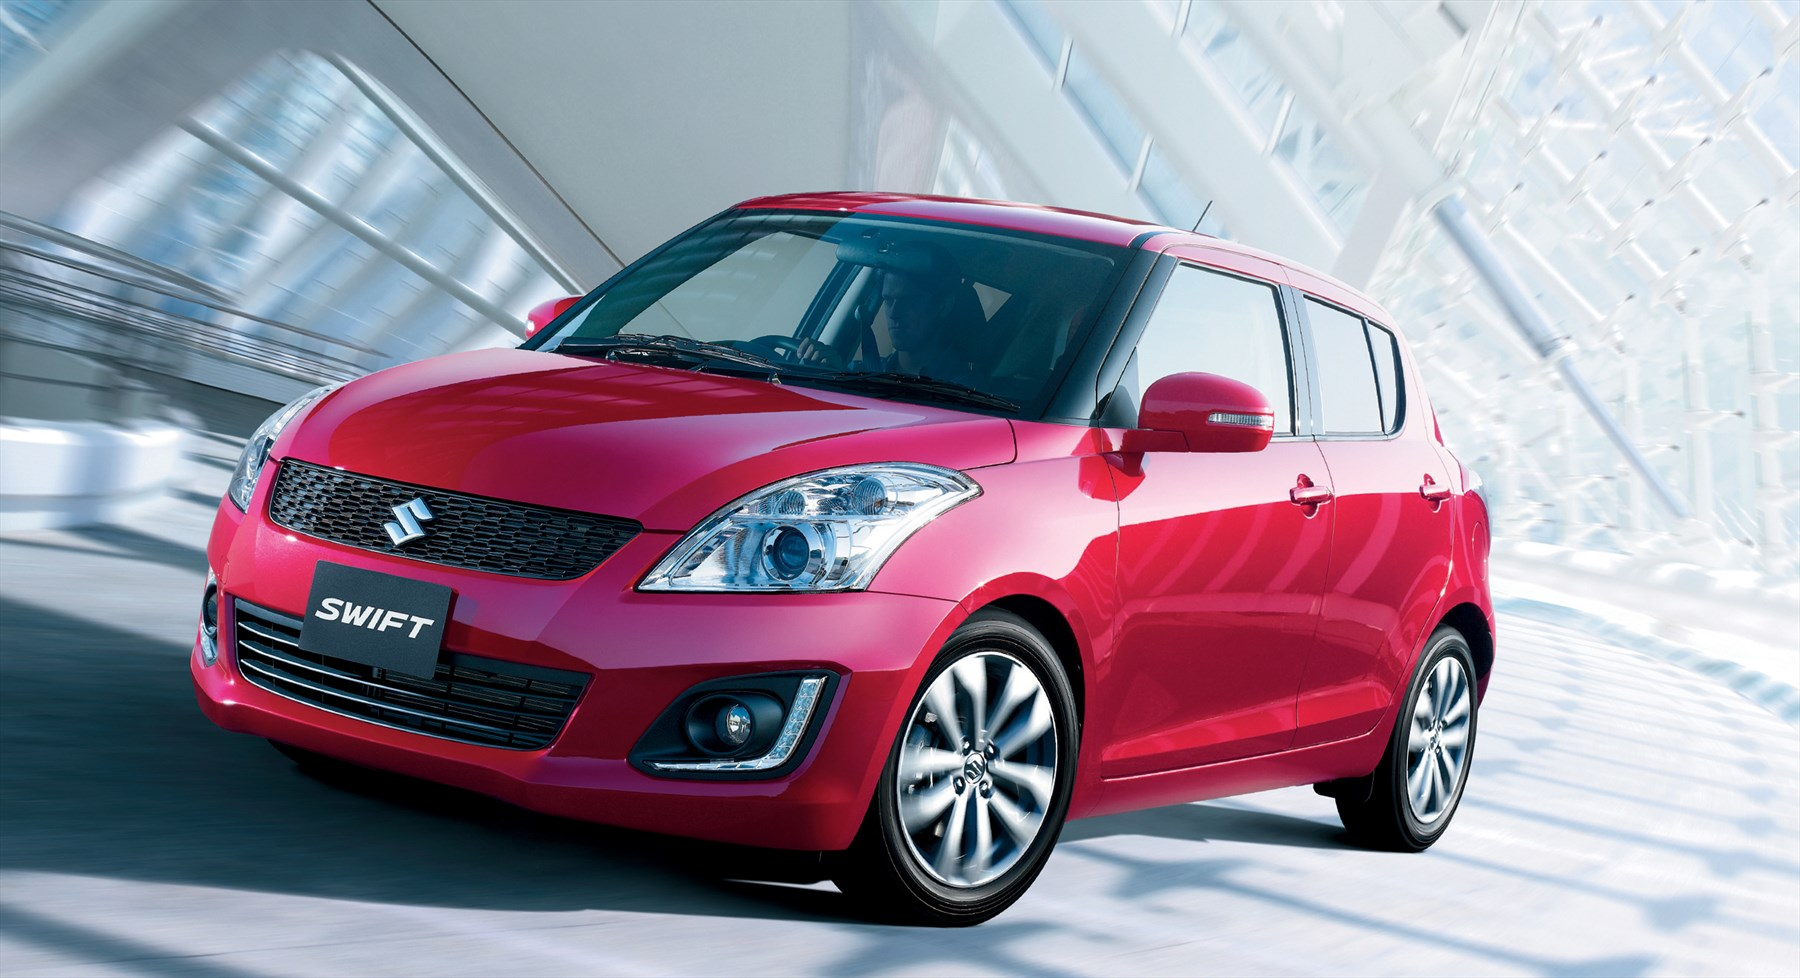 Suzuki Swift is Climbing Swiftly: Latest News